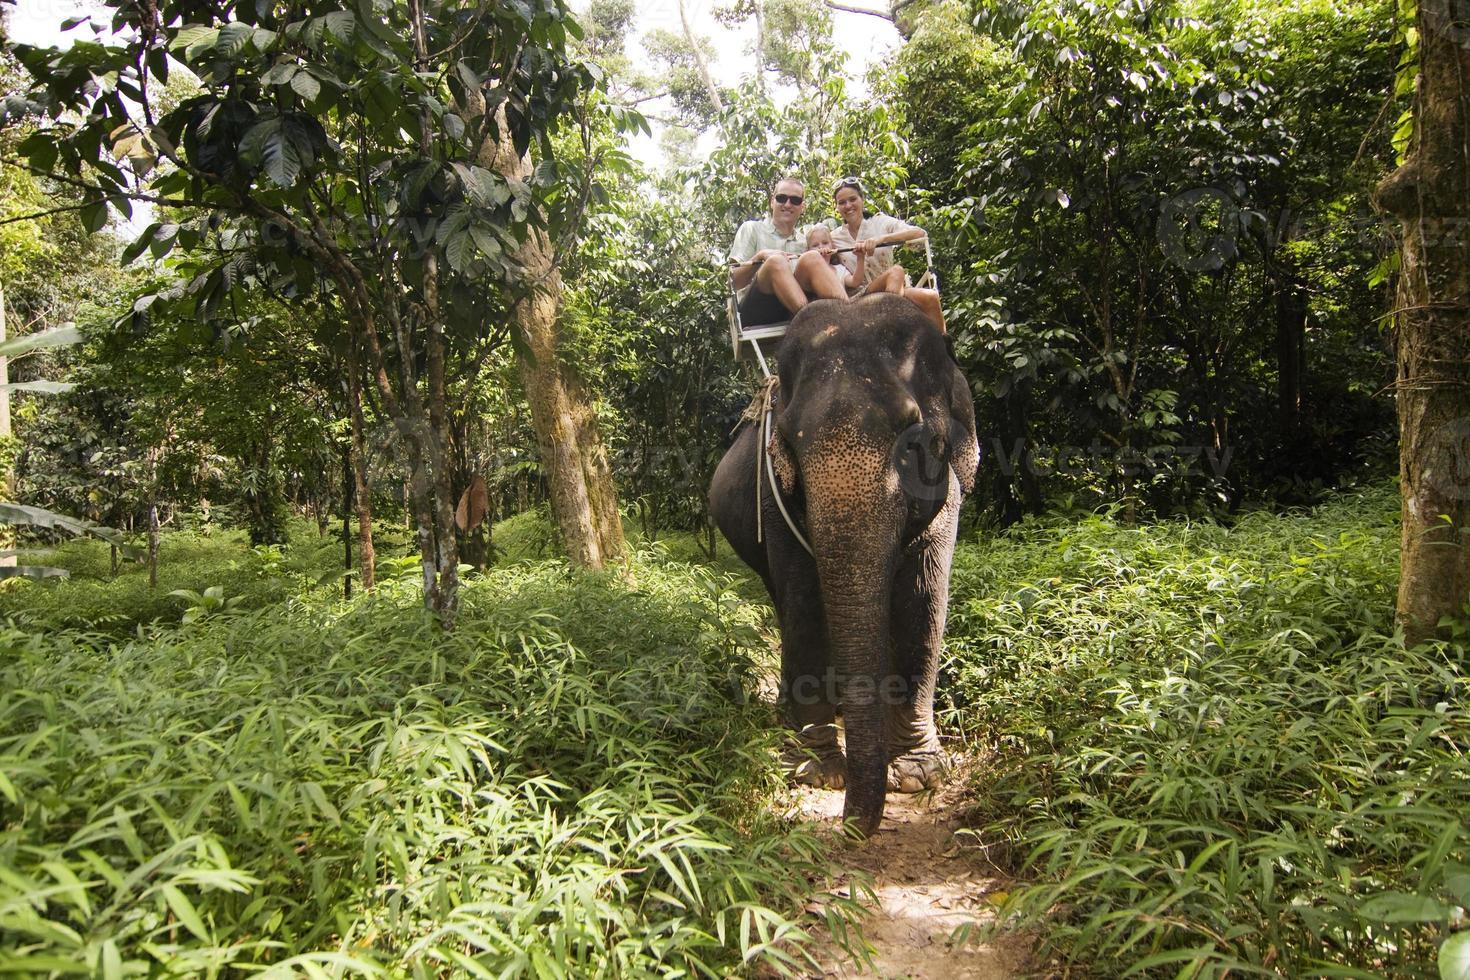 giro in elefante in famiglia foto